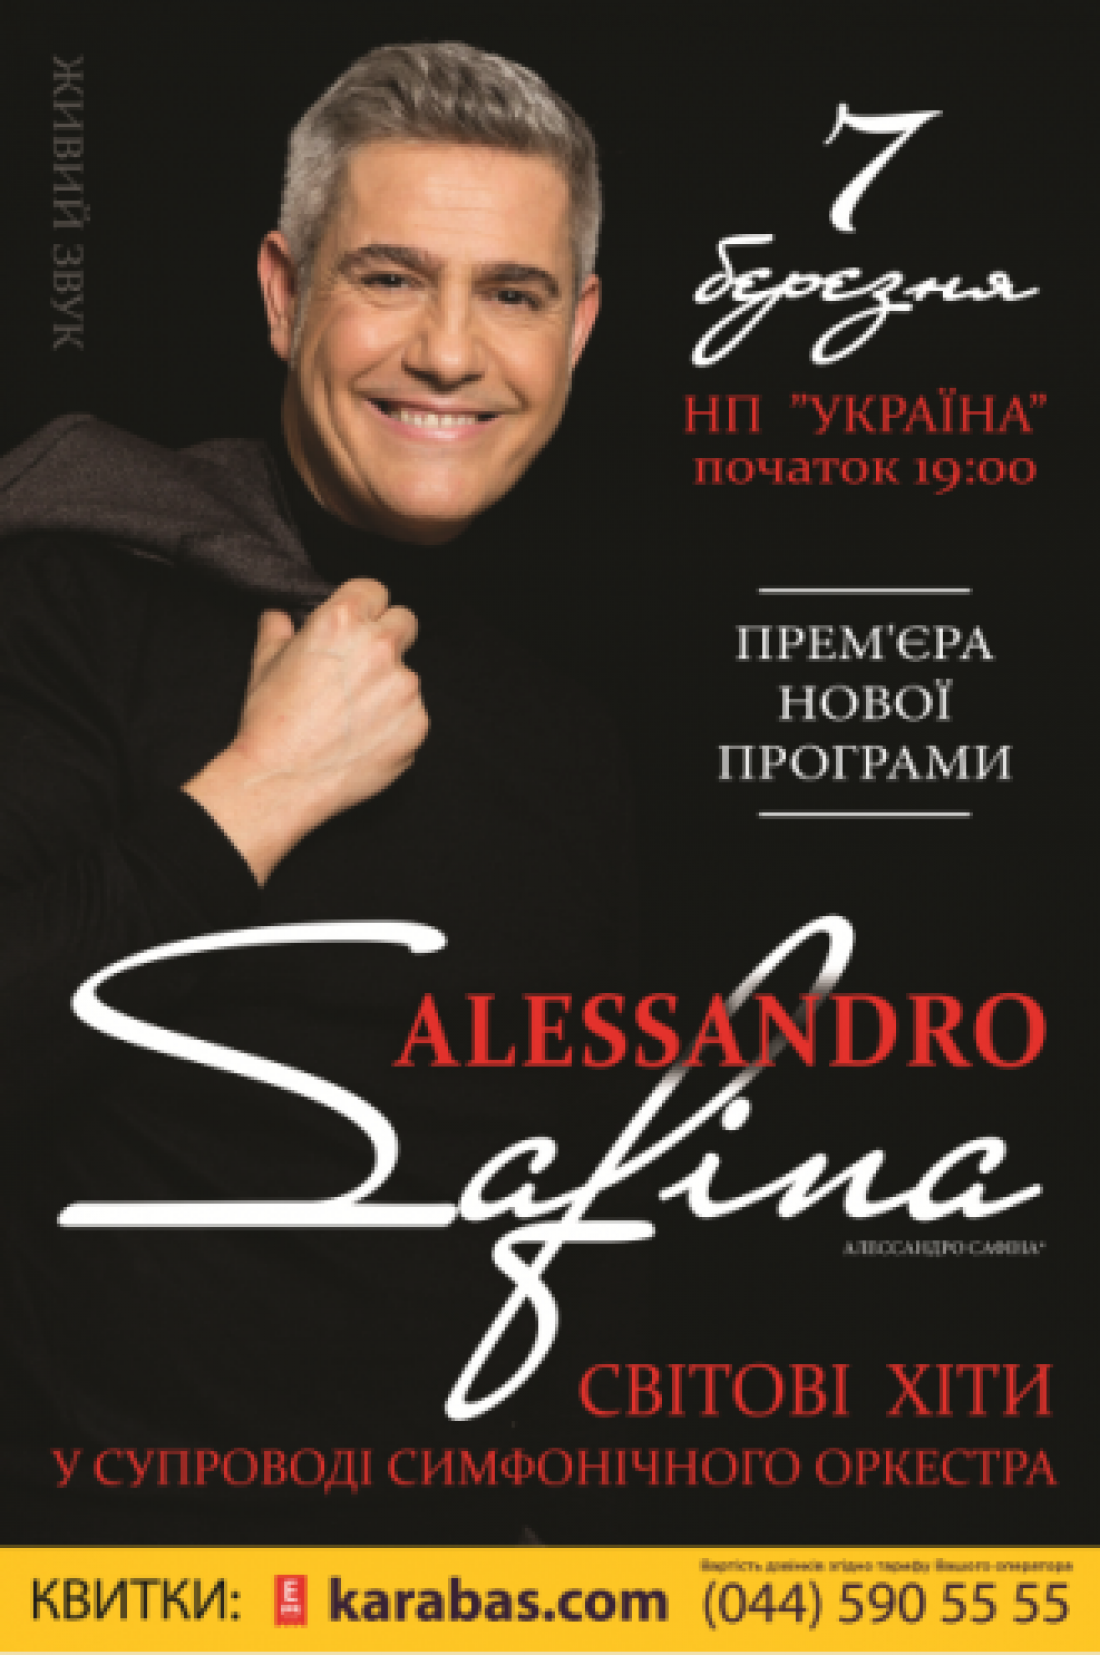 Афиша концерта Сафина в Киеве